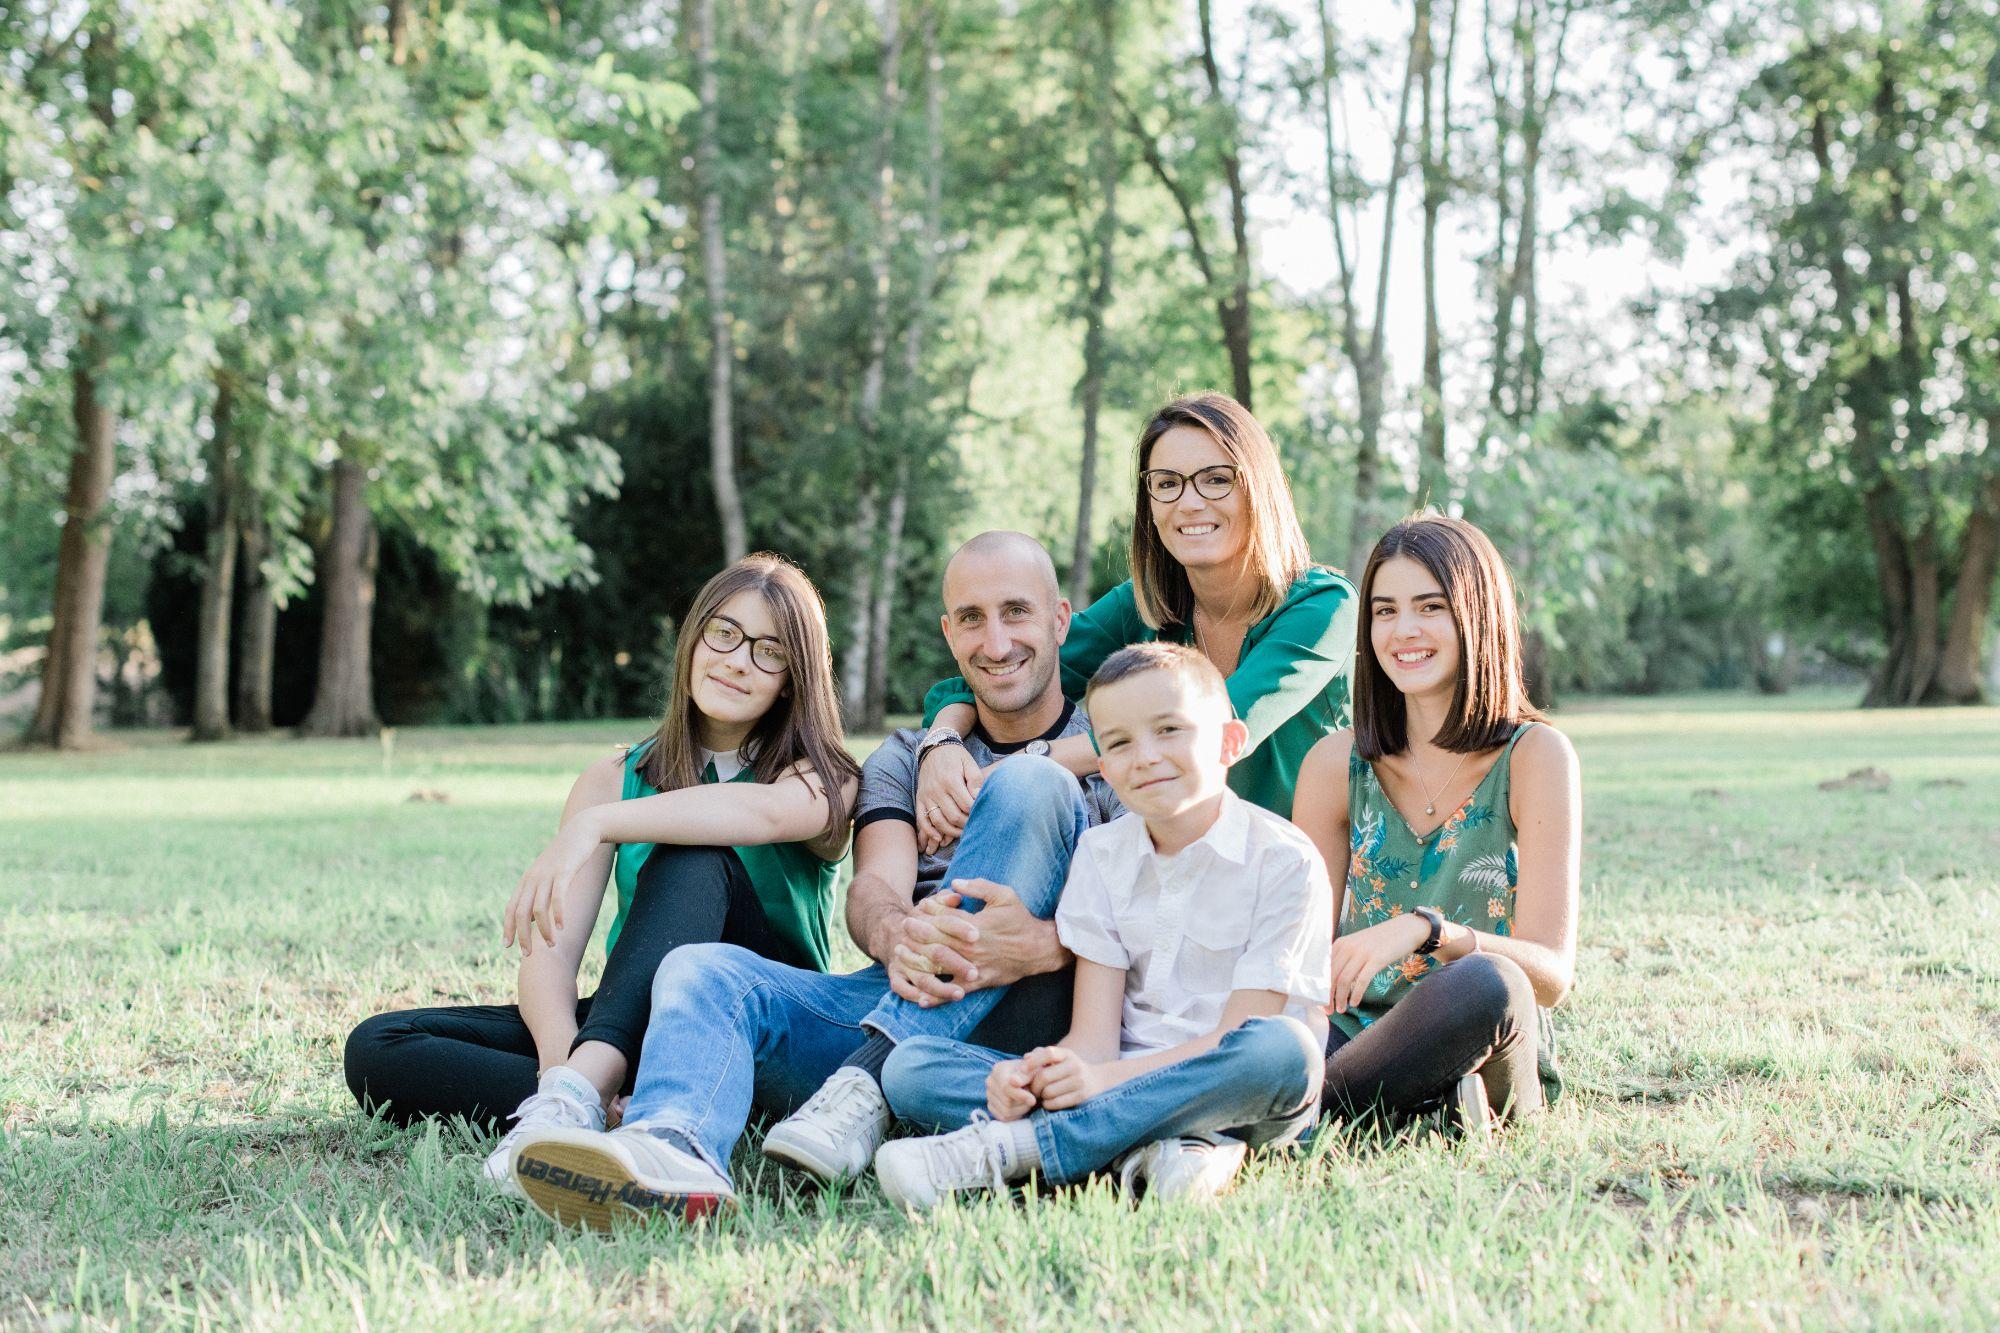 priscillapuzenat-photographe-famille-chevannes-yonne-bourgogne-france